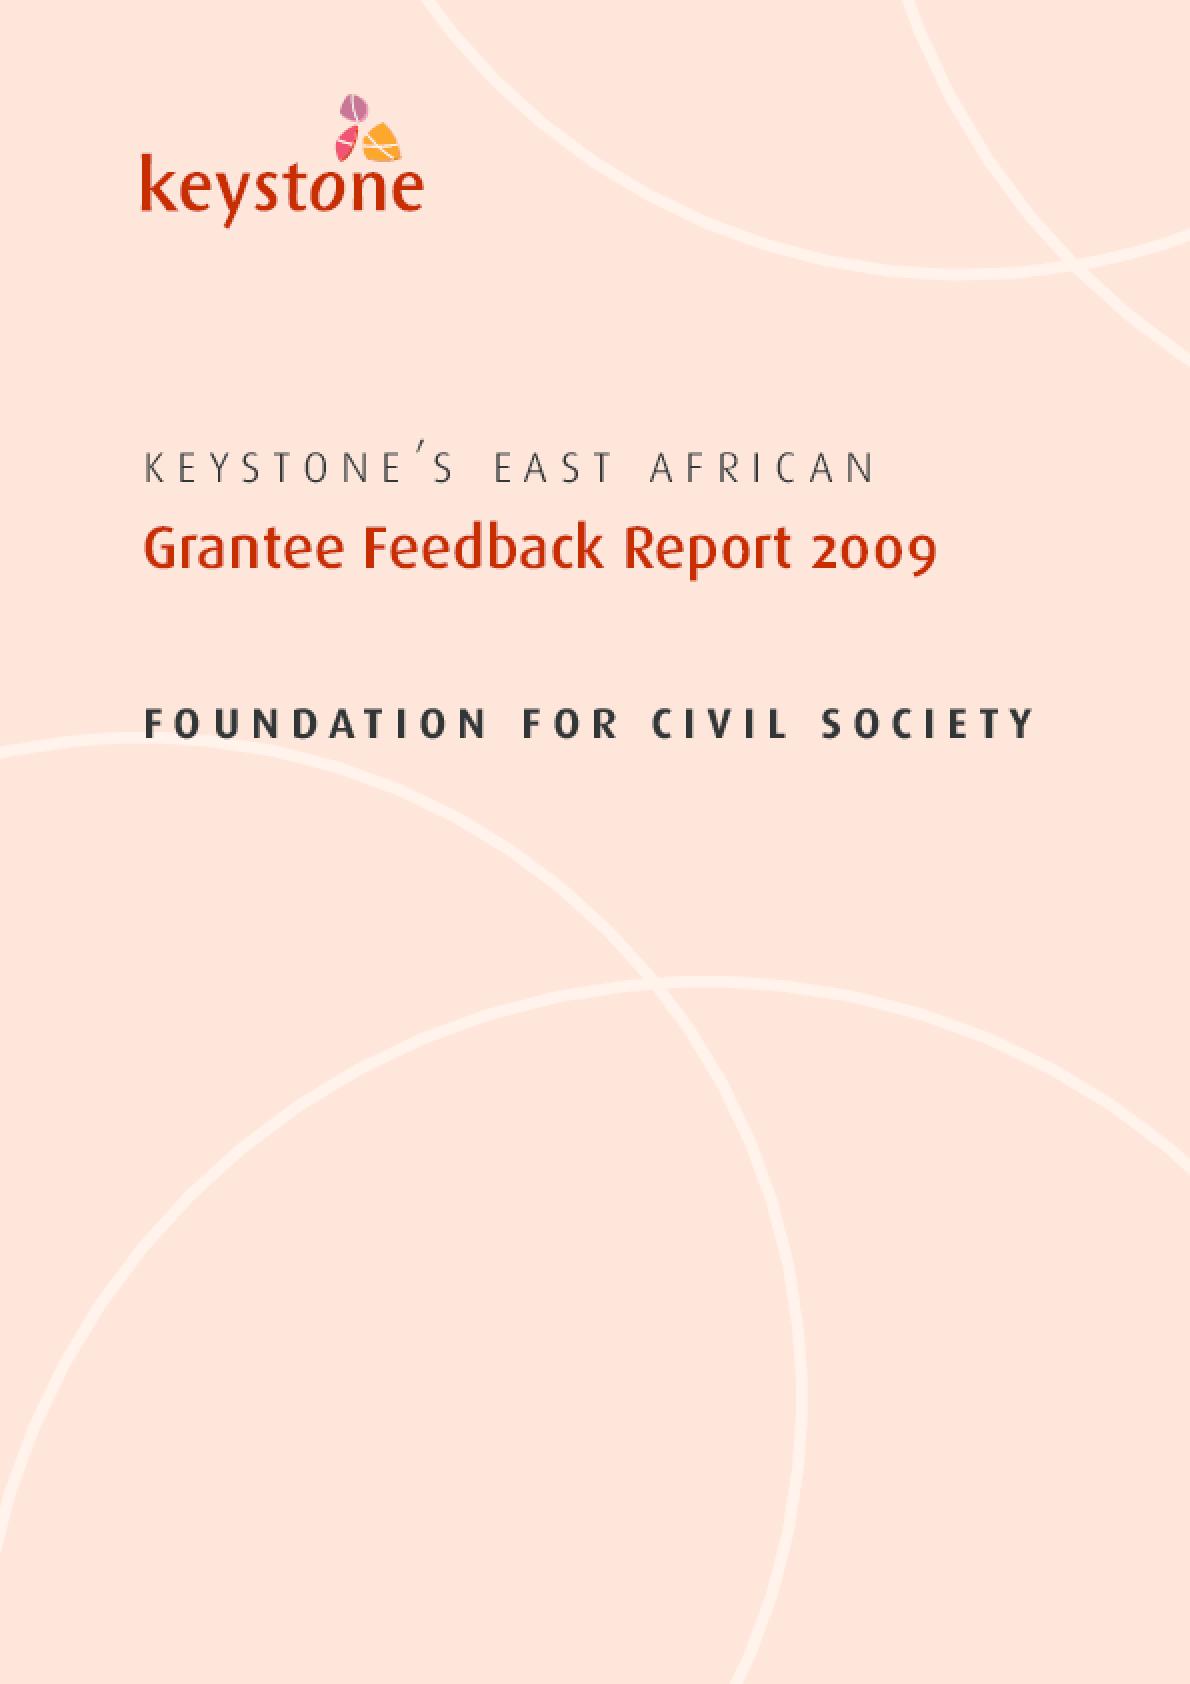 Grantee Feedback Report 2009